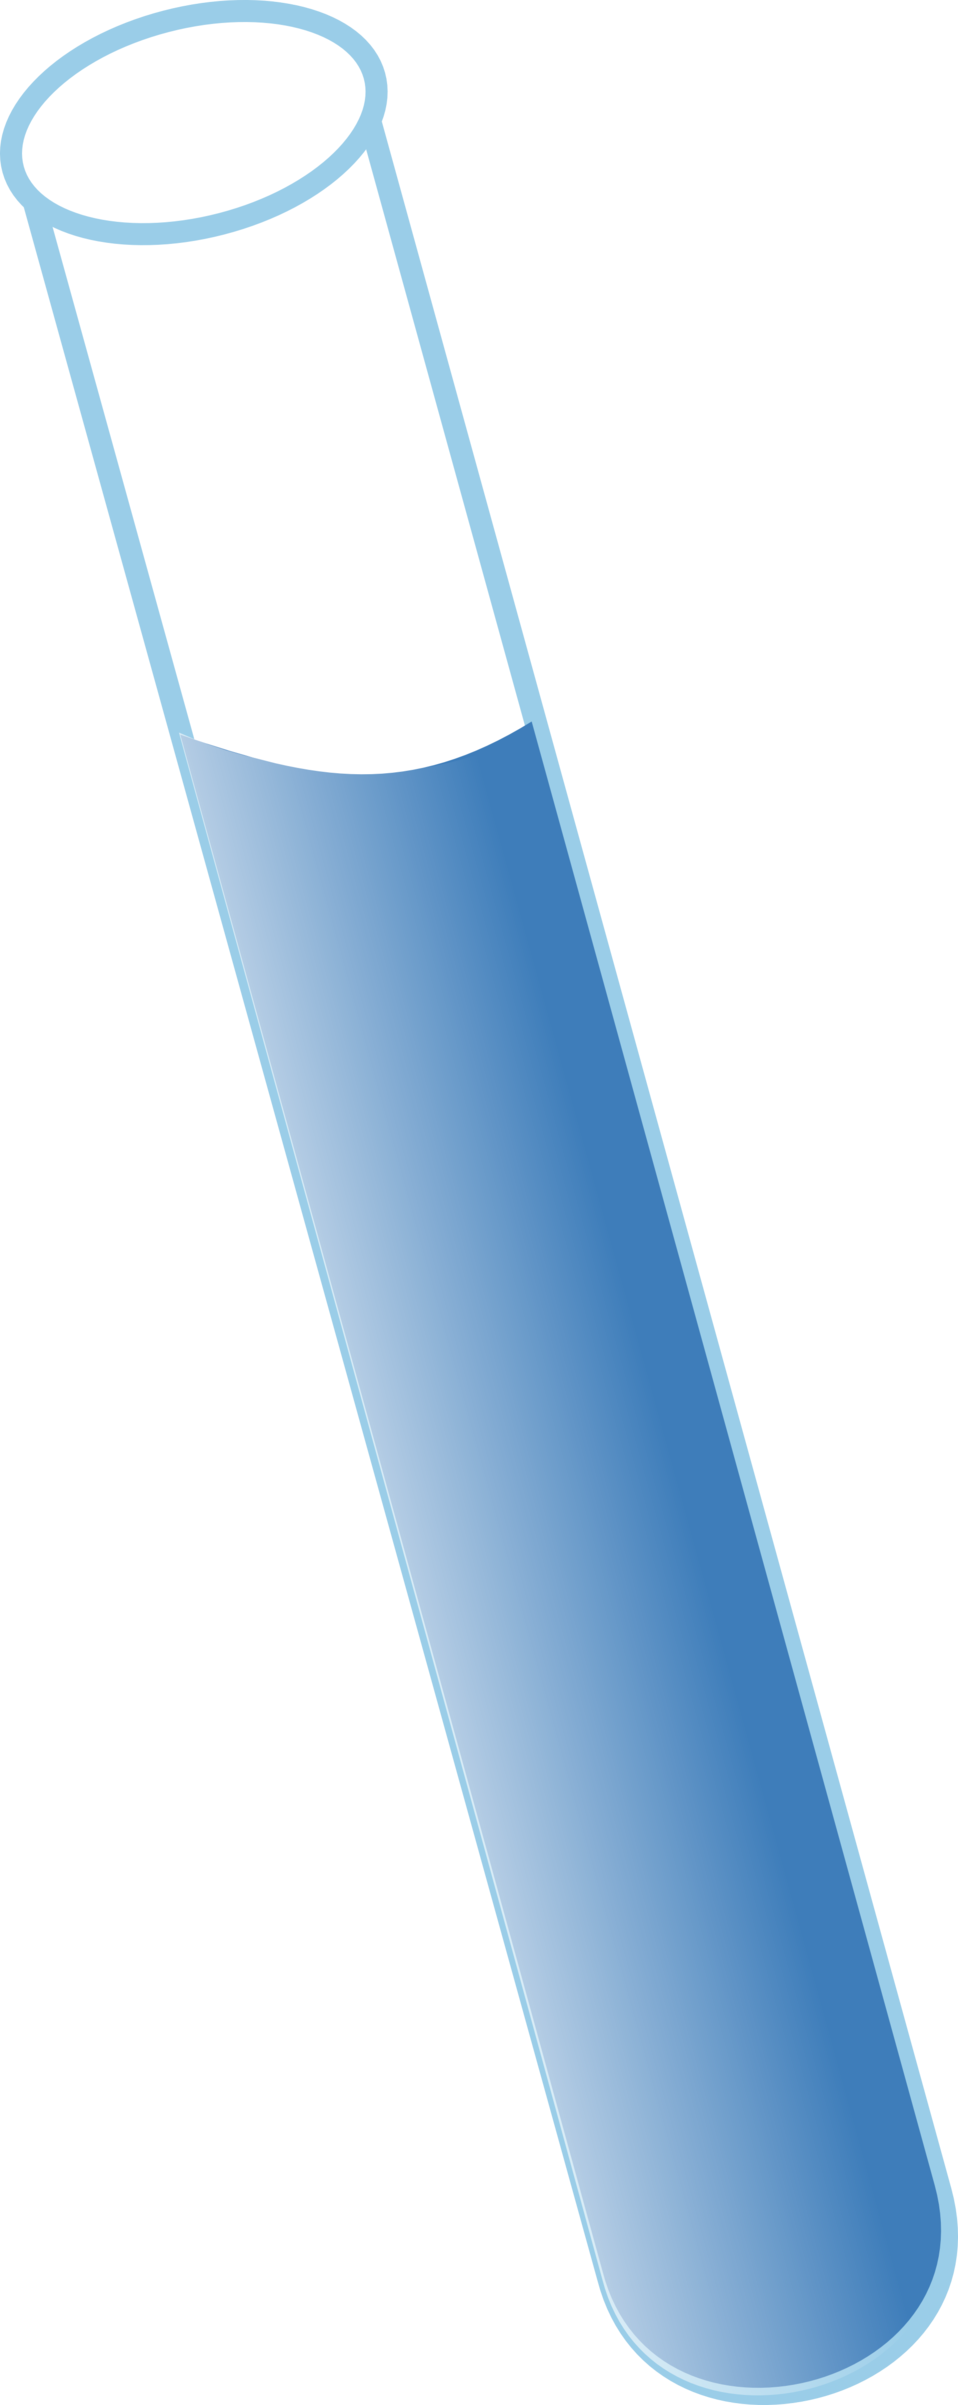 Tubo de Ensaio